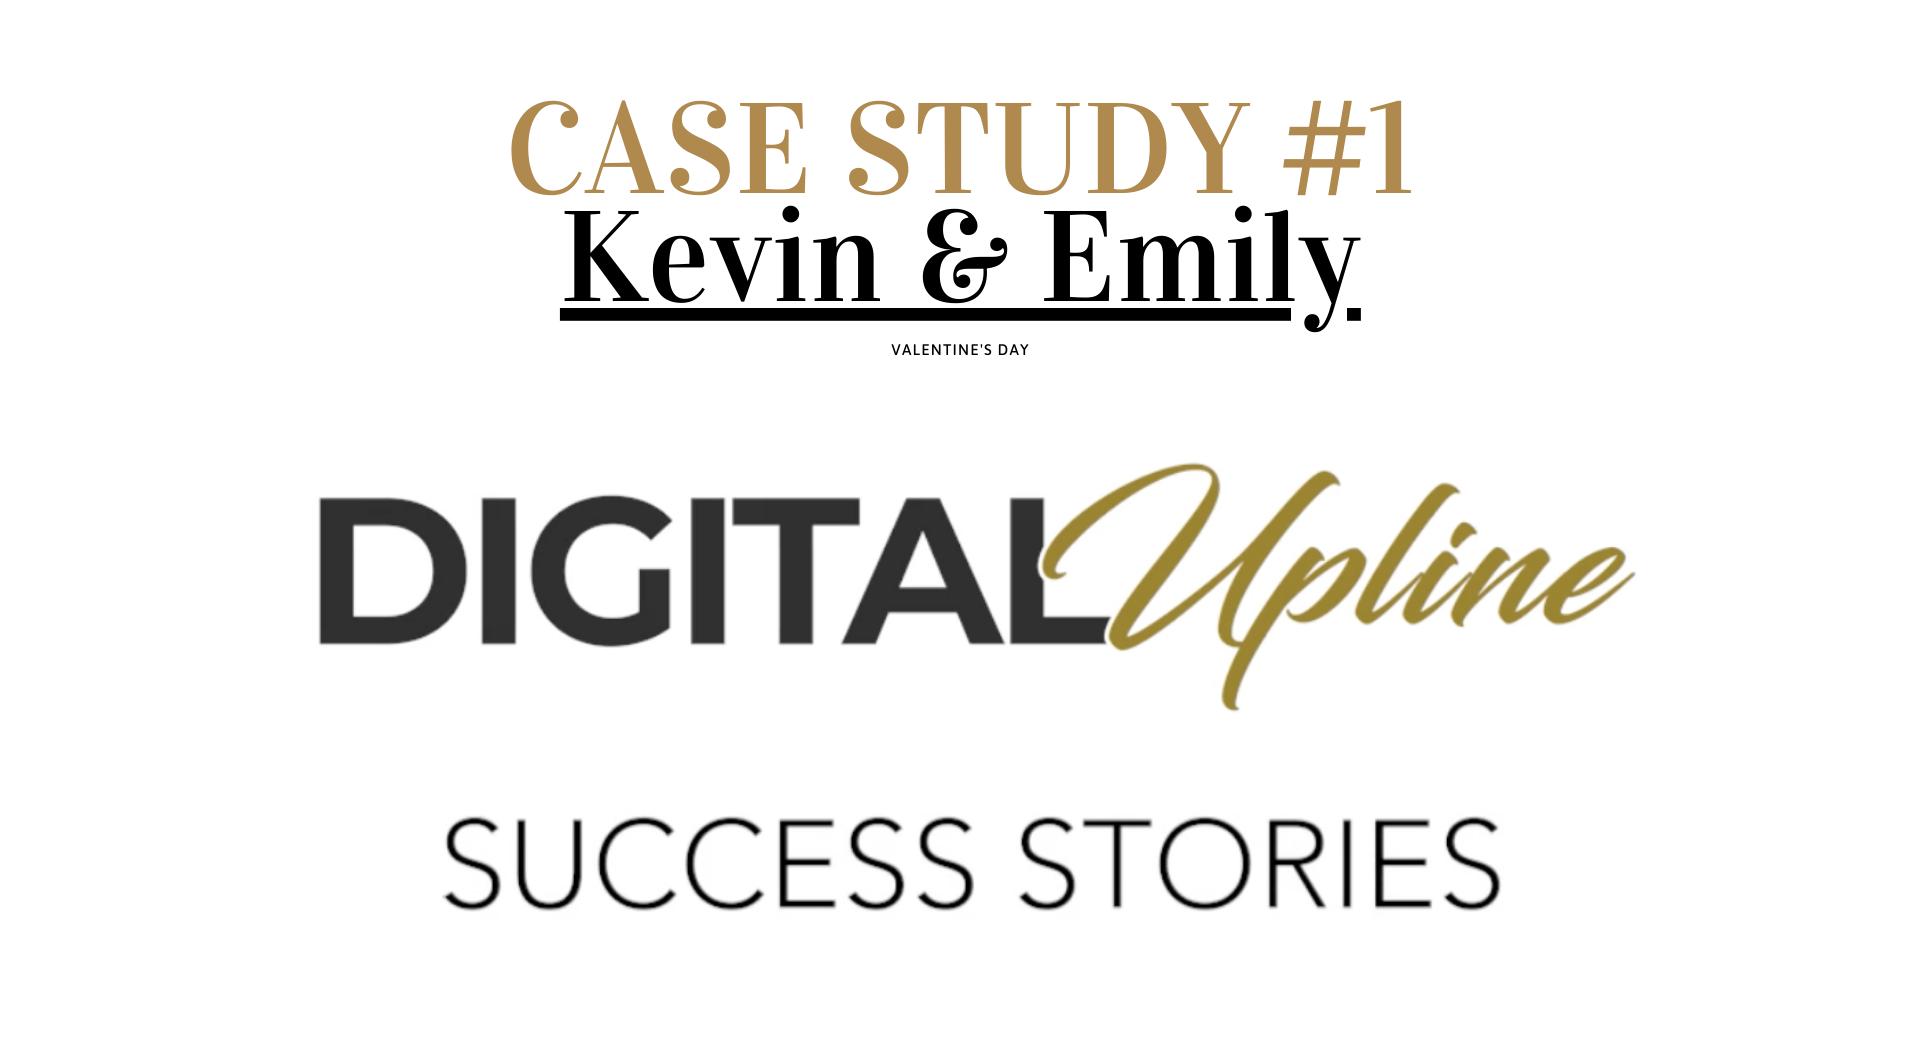 case study #1 Kevin & Emily